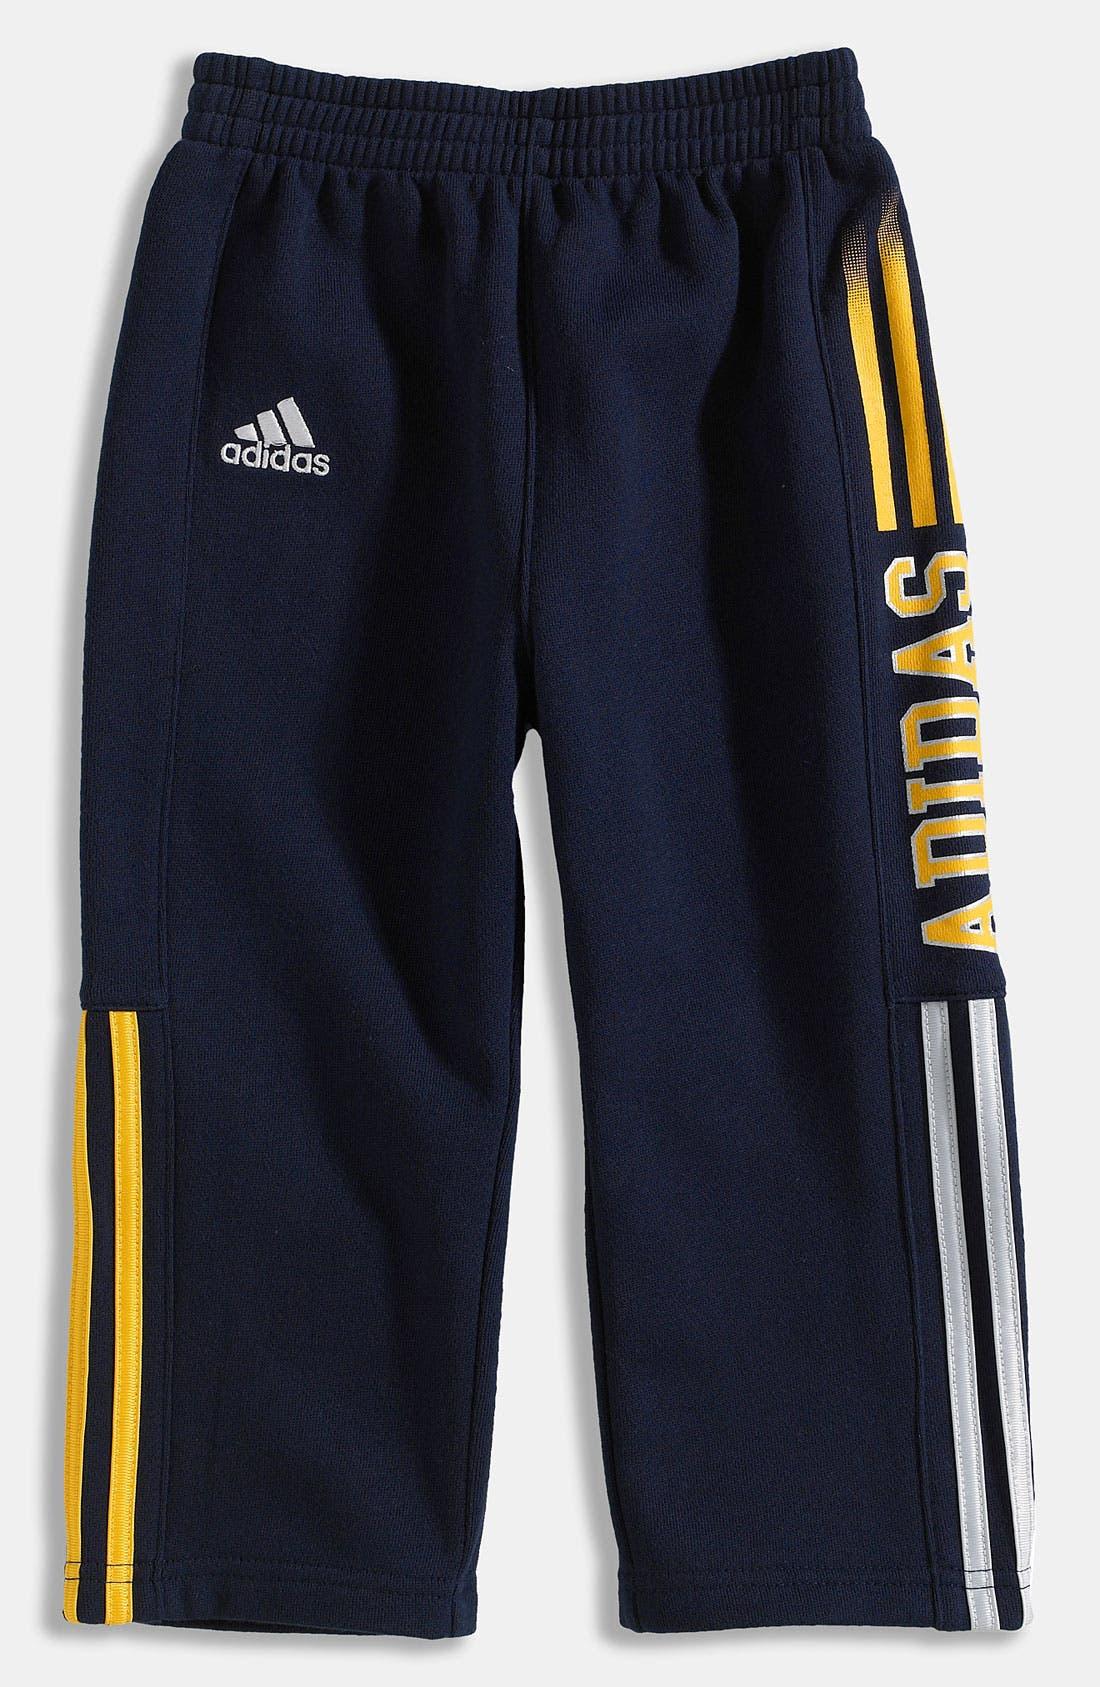 Main Image - adidas 'Action' Pants (Toddler)